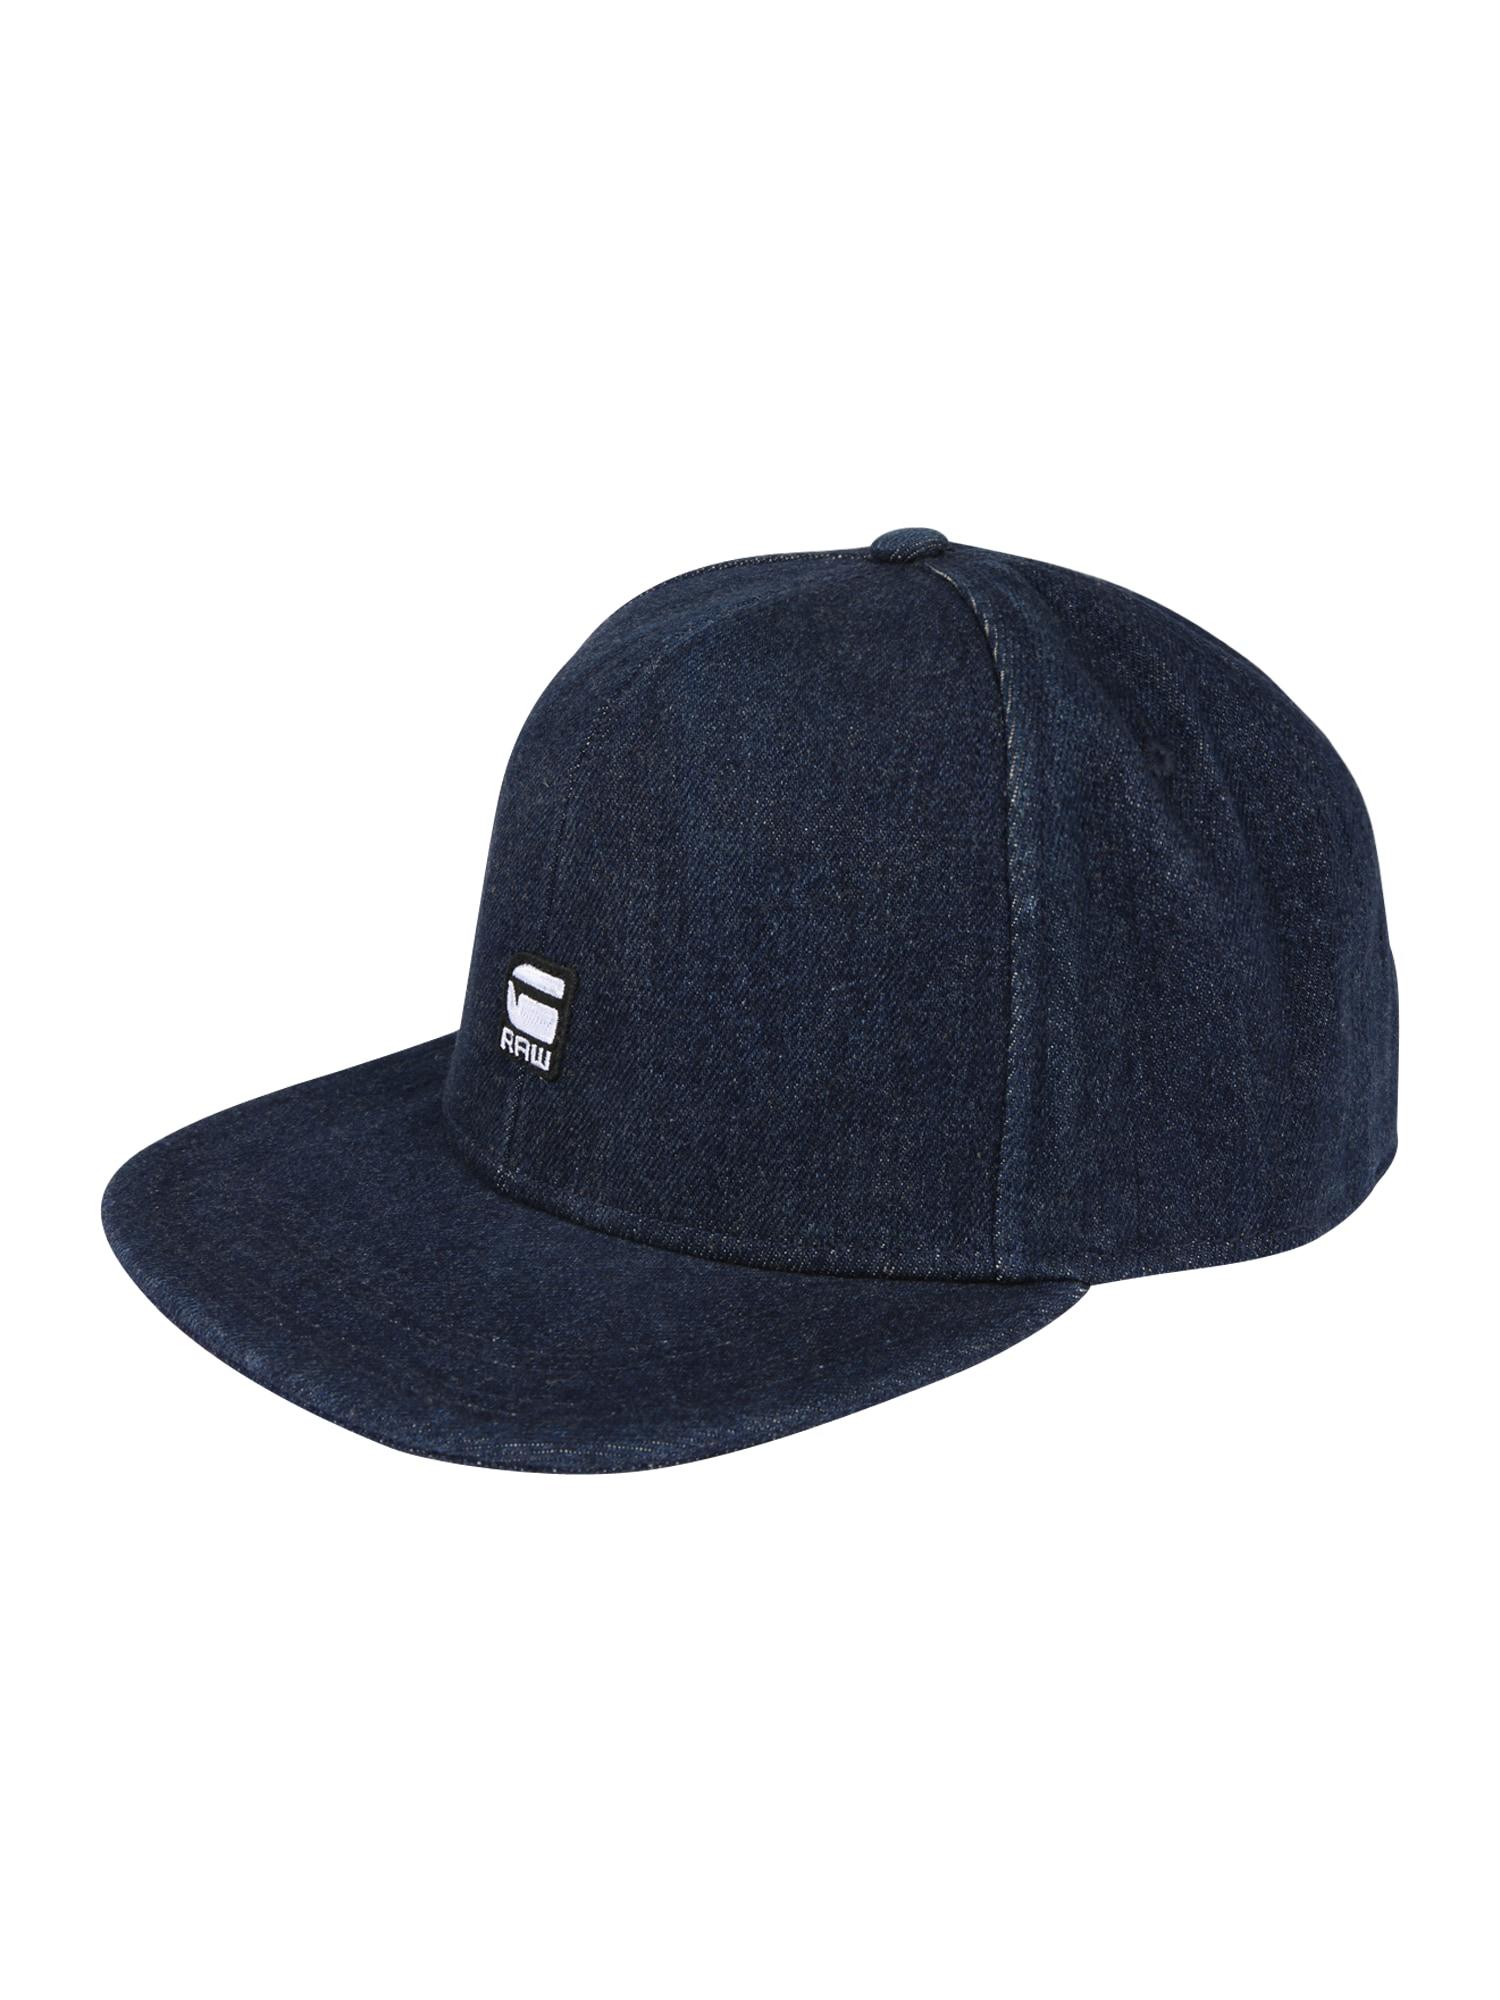 Kšiltovka Data snapback cap tmavě modrá G-STAR RAW